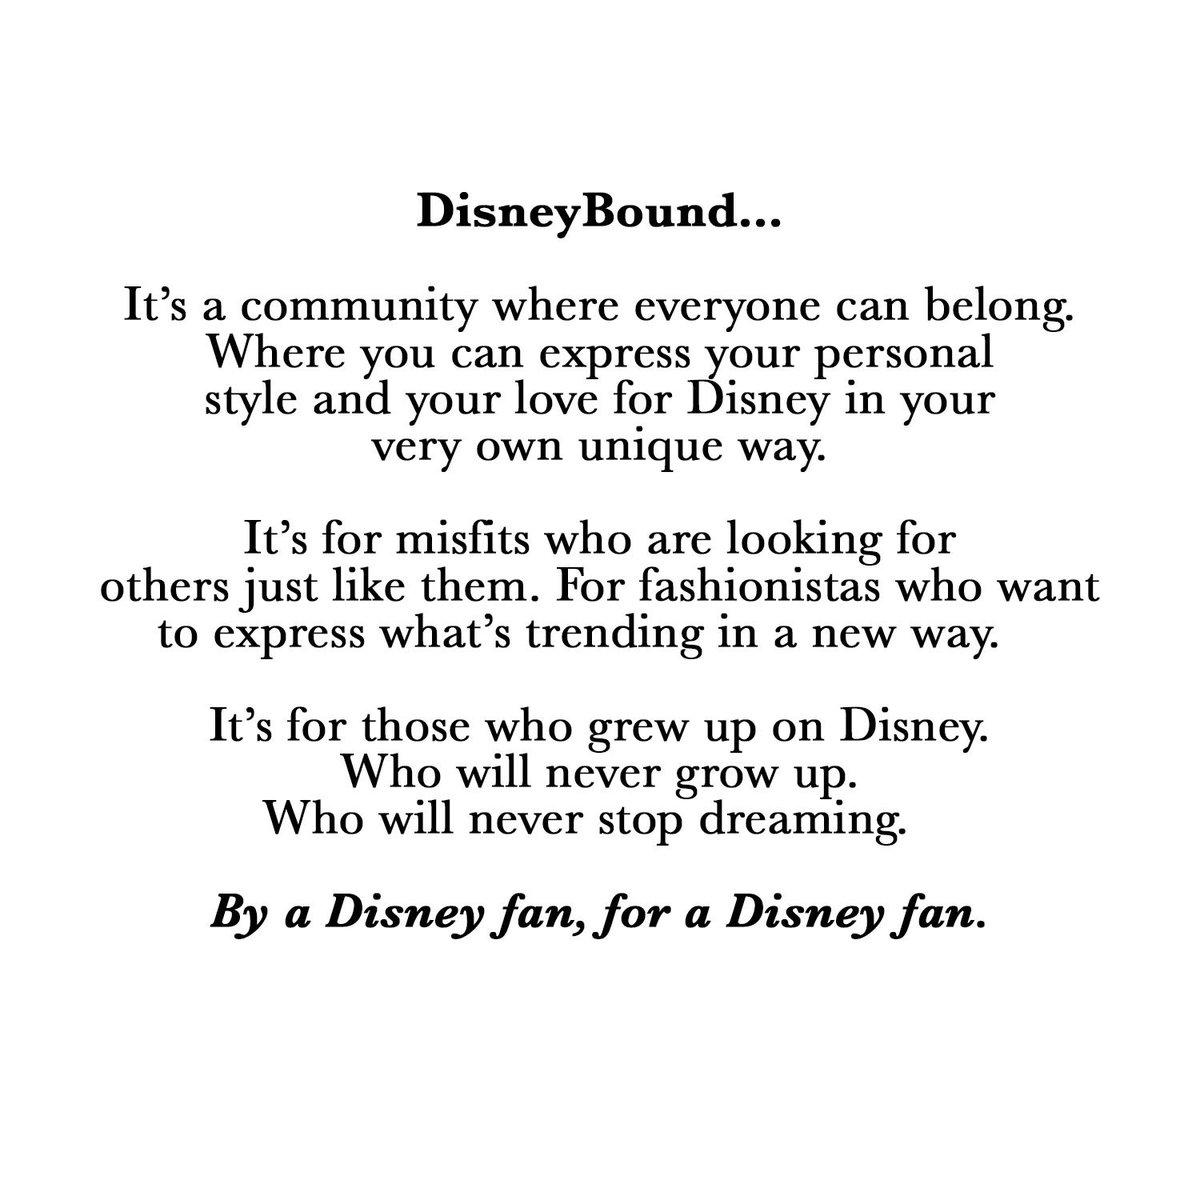 Never, ever stop dreaming. #disneybound #fortheloveofdisney #disney <br>http://pic.twitter.com/EYnv2Utqb3